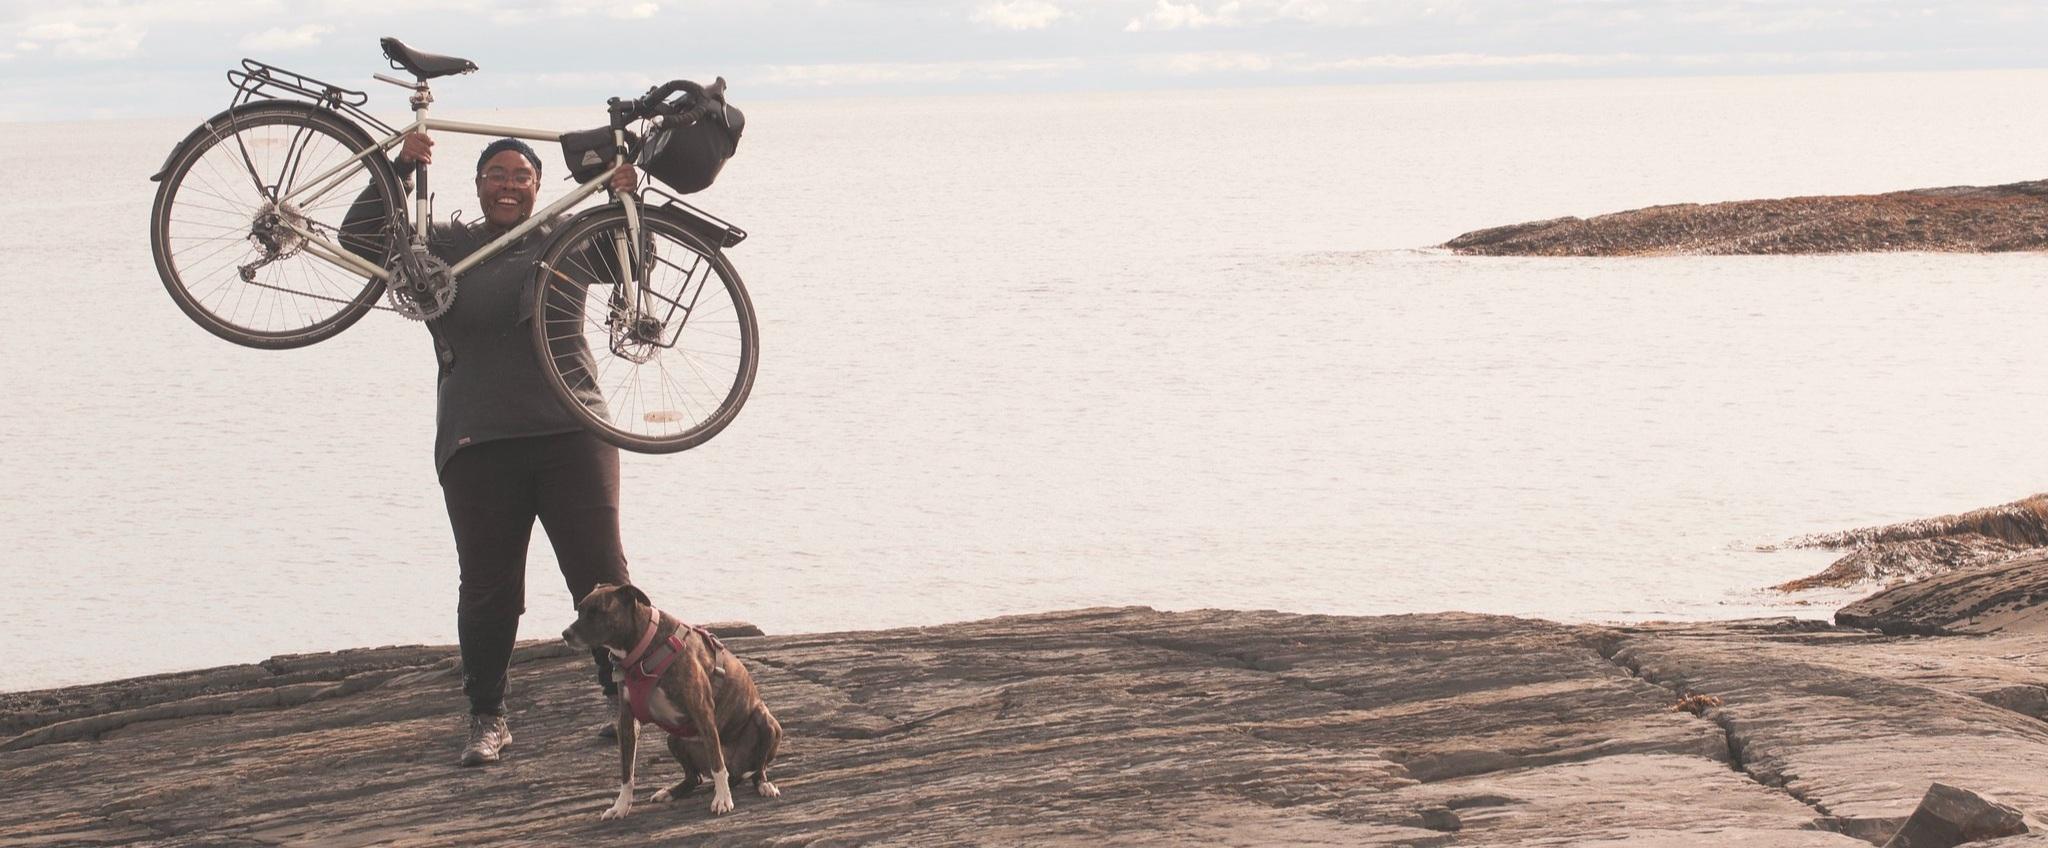 jasmine+reese+world+bicycle+tour+portrait.jpg